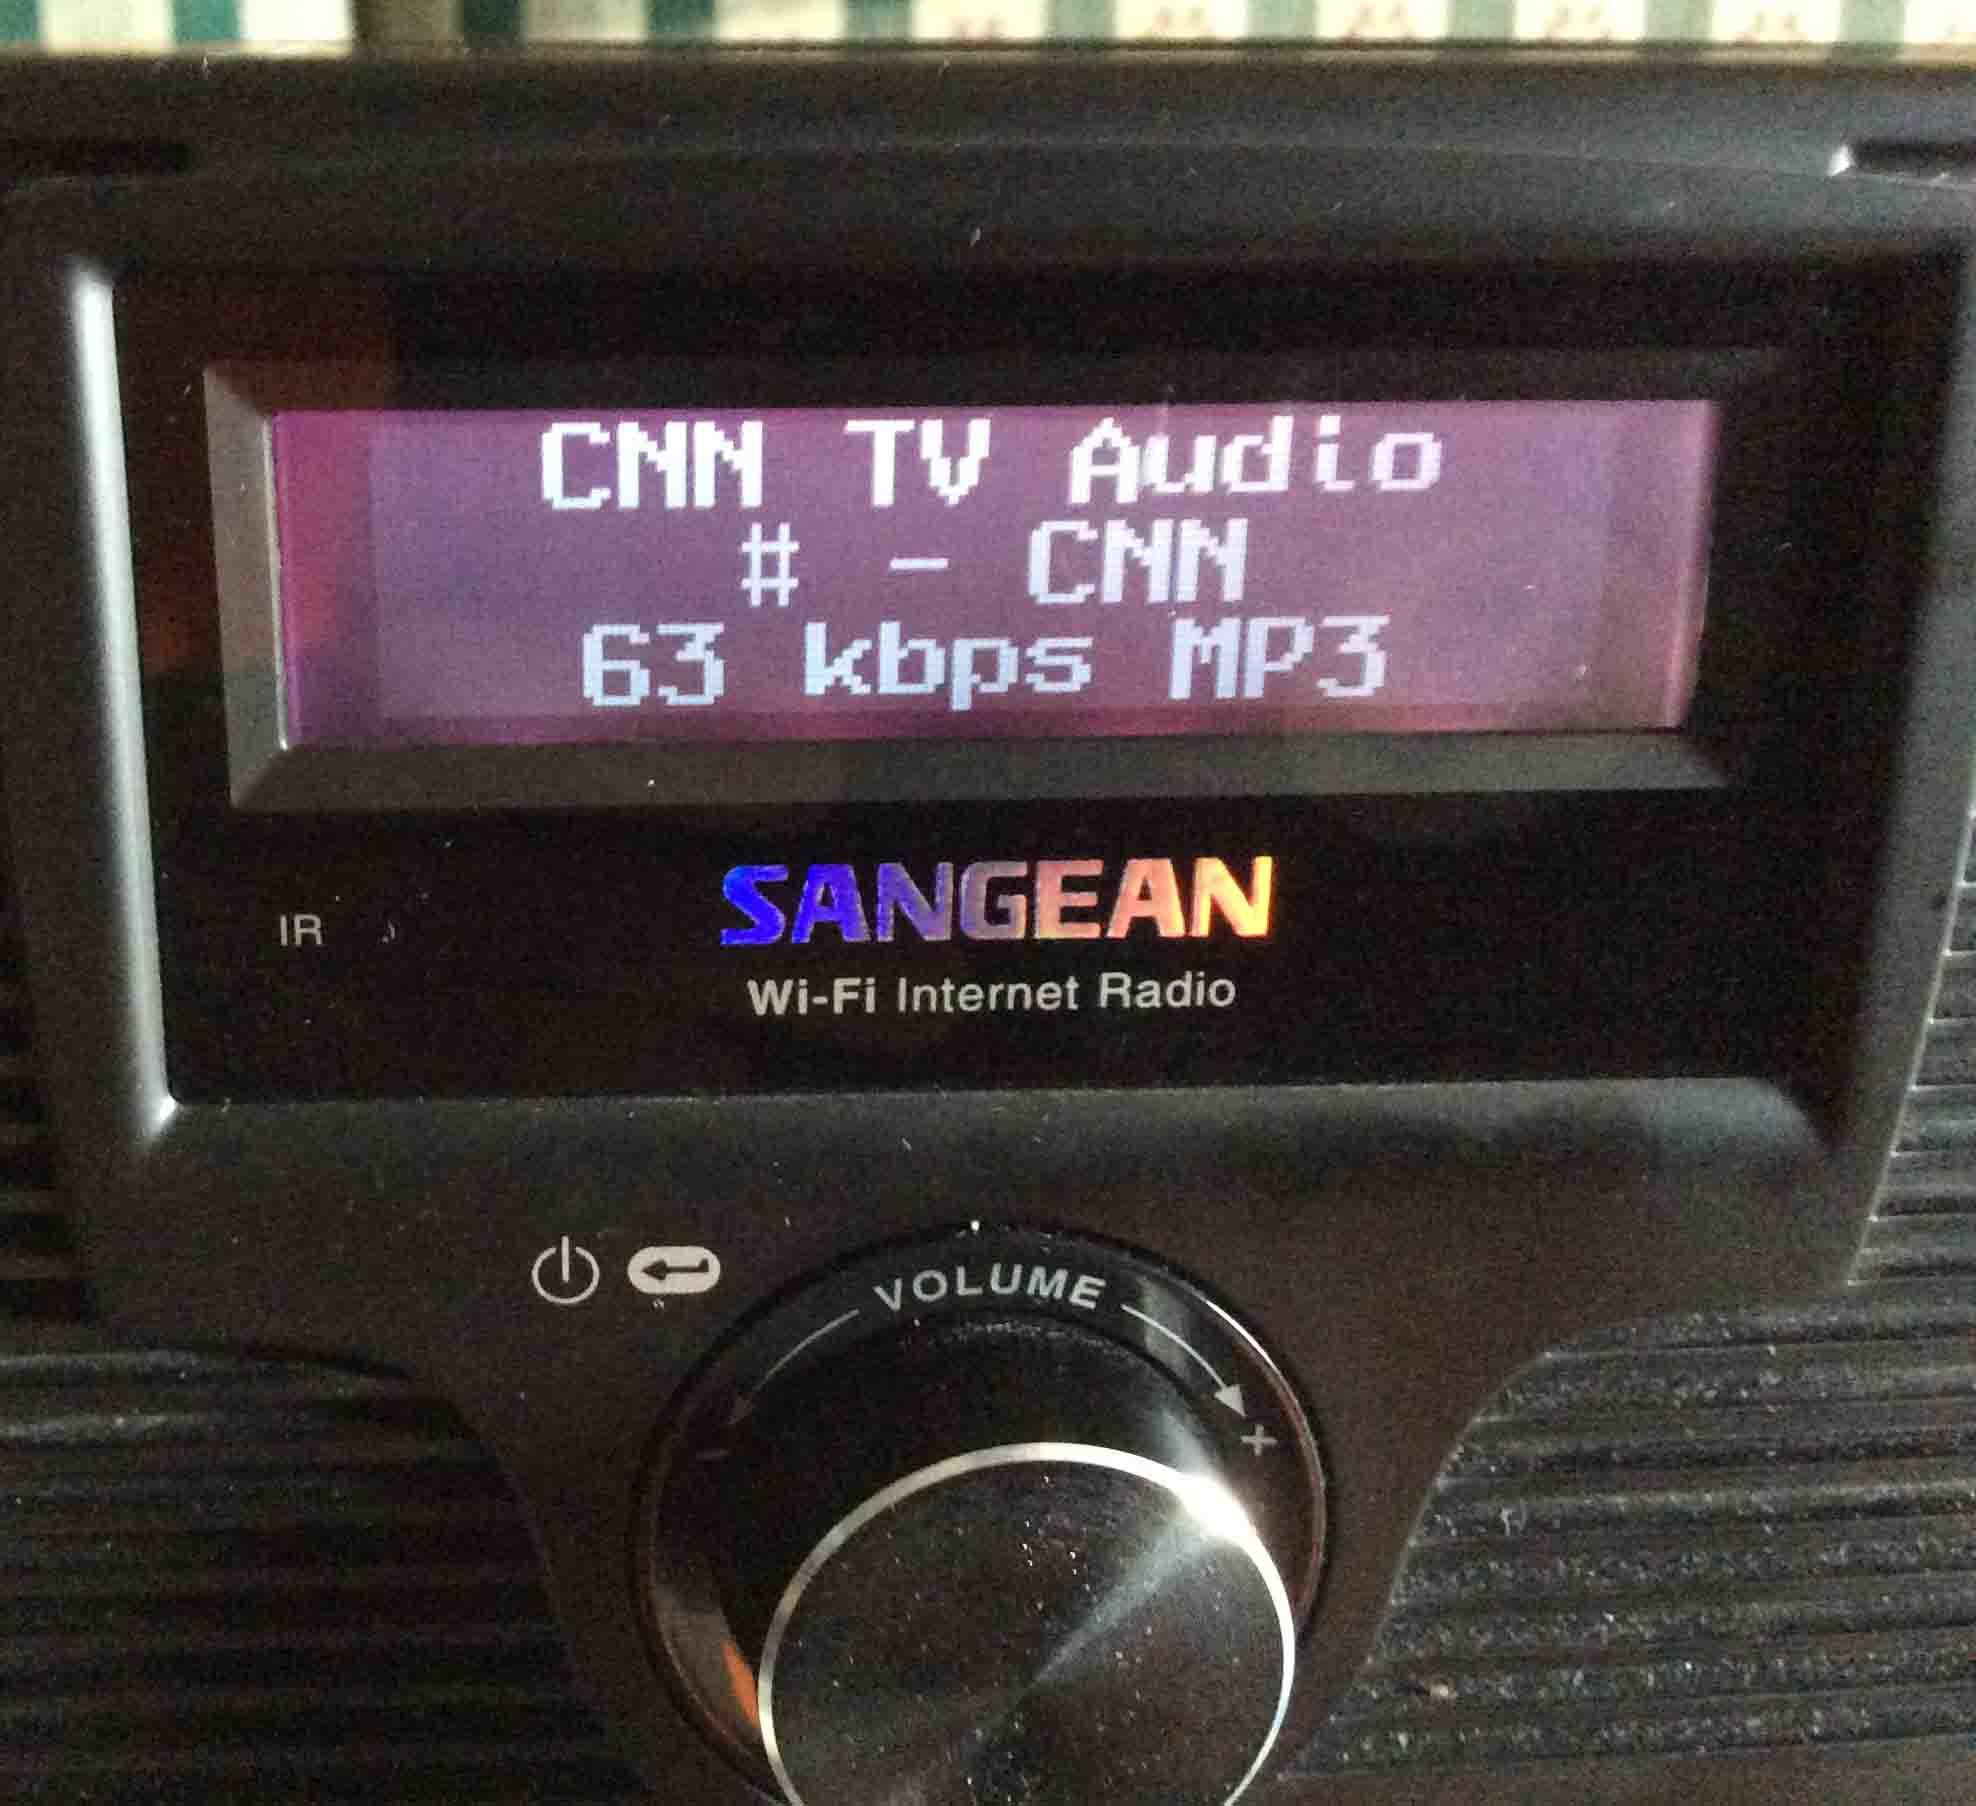 How to Change WiFi on Sangean WFR 20 Internet Radio | Tom's Tek Stop